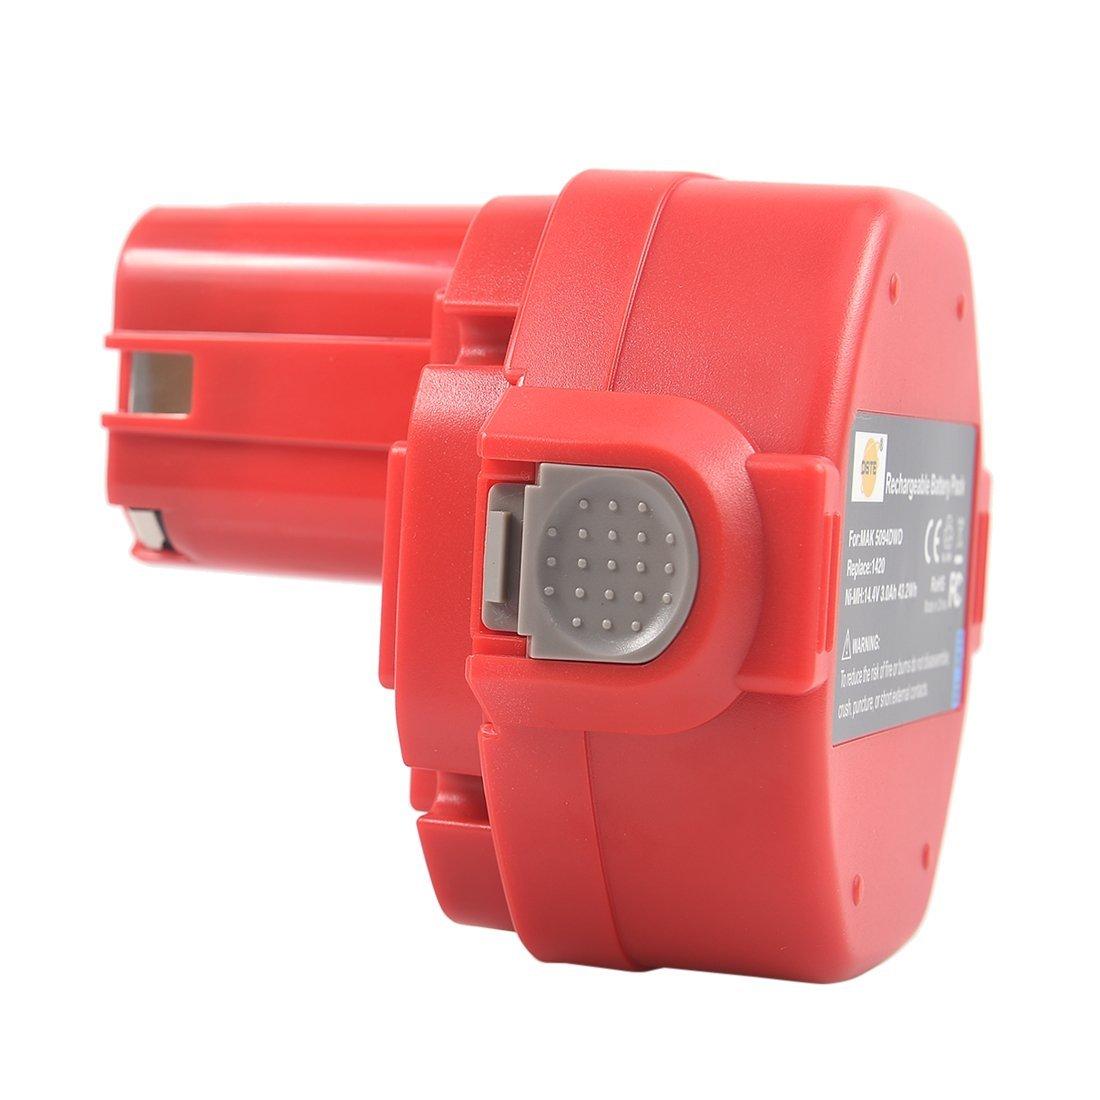 DSTE Ni-MH Power Tool Battery for Makita 1420 1422 1433 1434 1435 1435F 192699-A 193158-3 192600-1